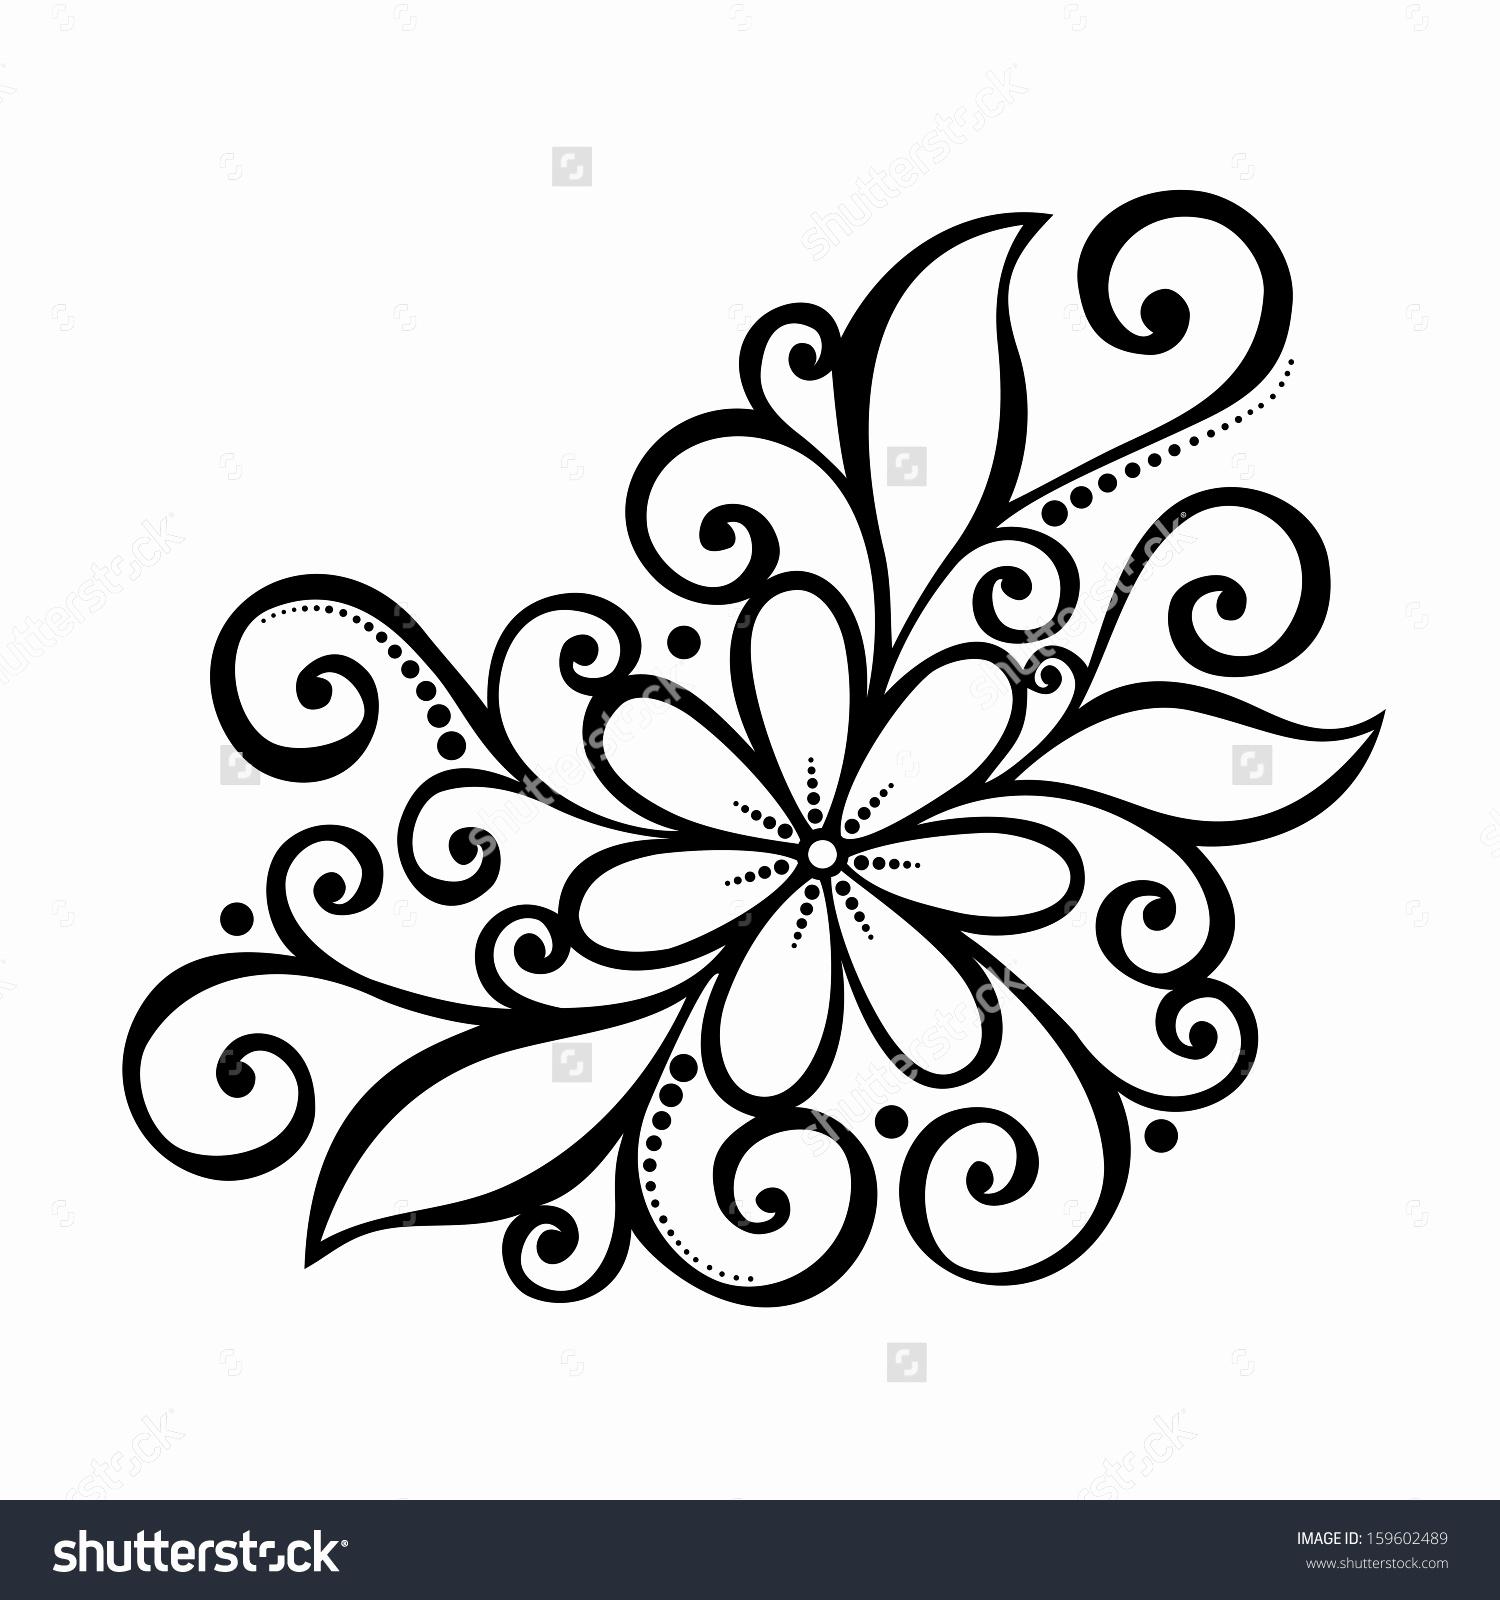 1500x1600 Flower Vase Drawing Fresh Drawings Beautiful Flowers Beautiful